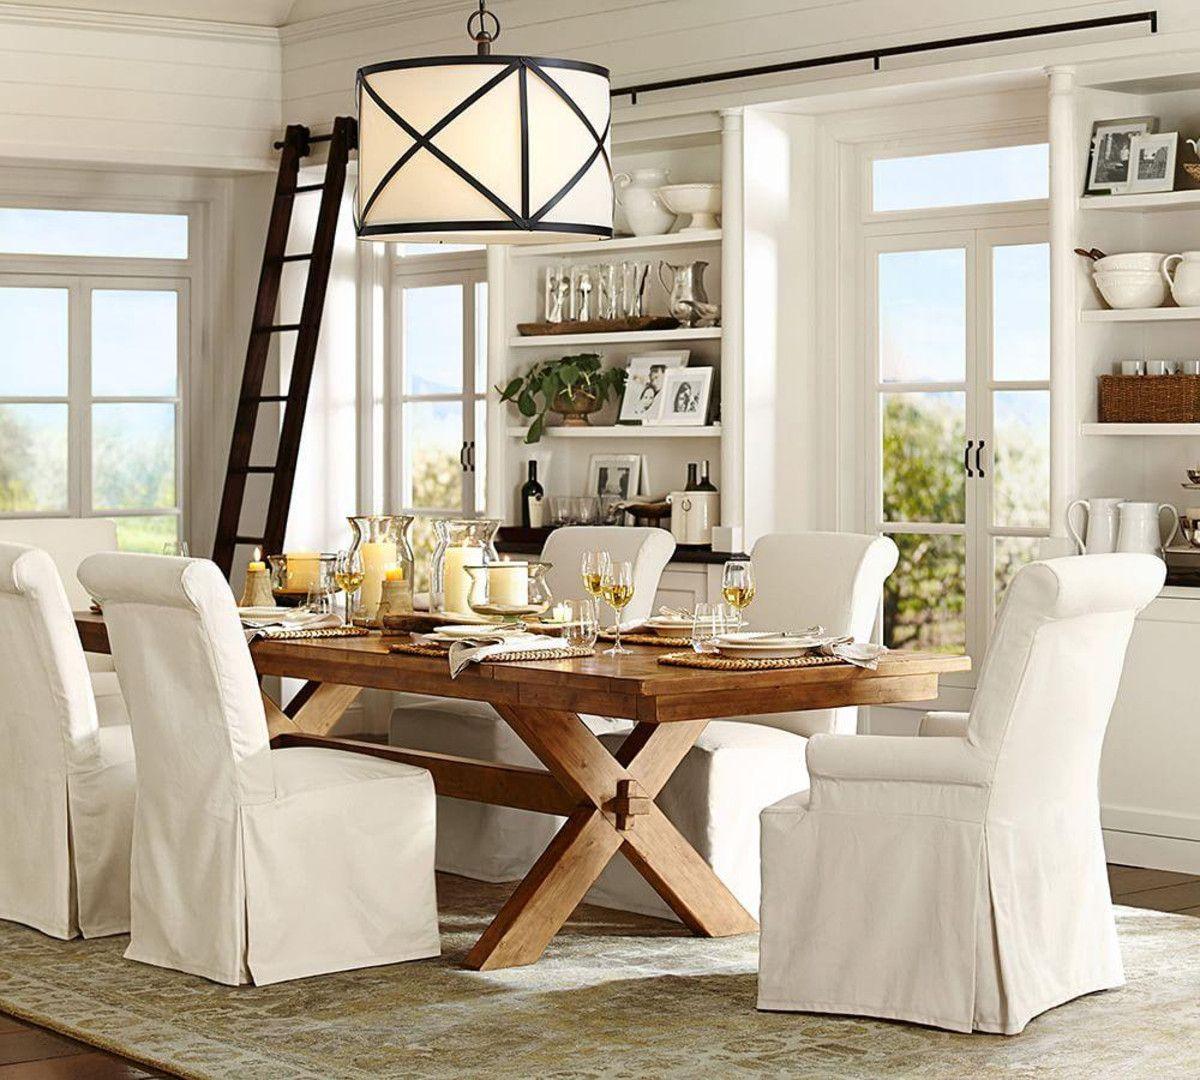 Marvelous Toscana Extending Dining Table | Pottery Barn AU